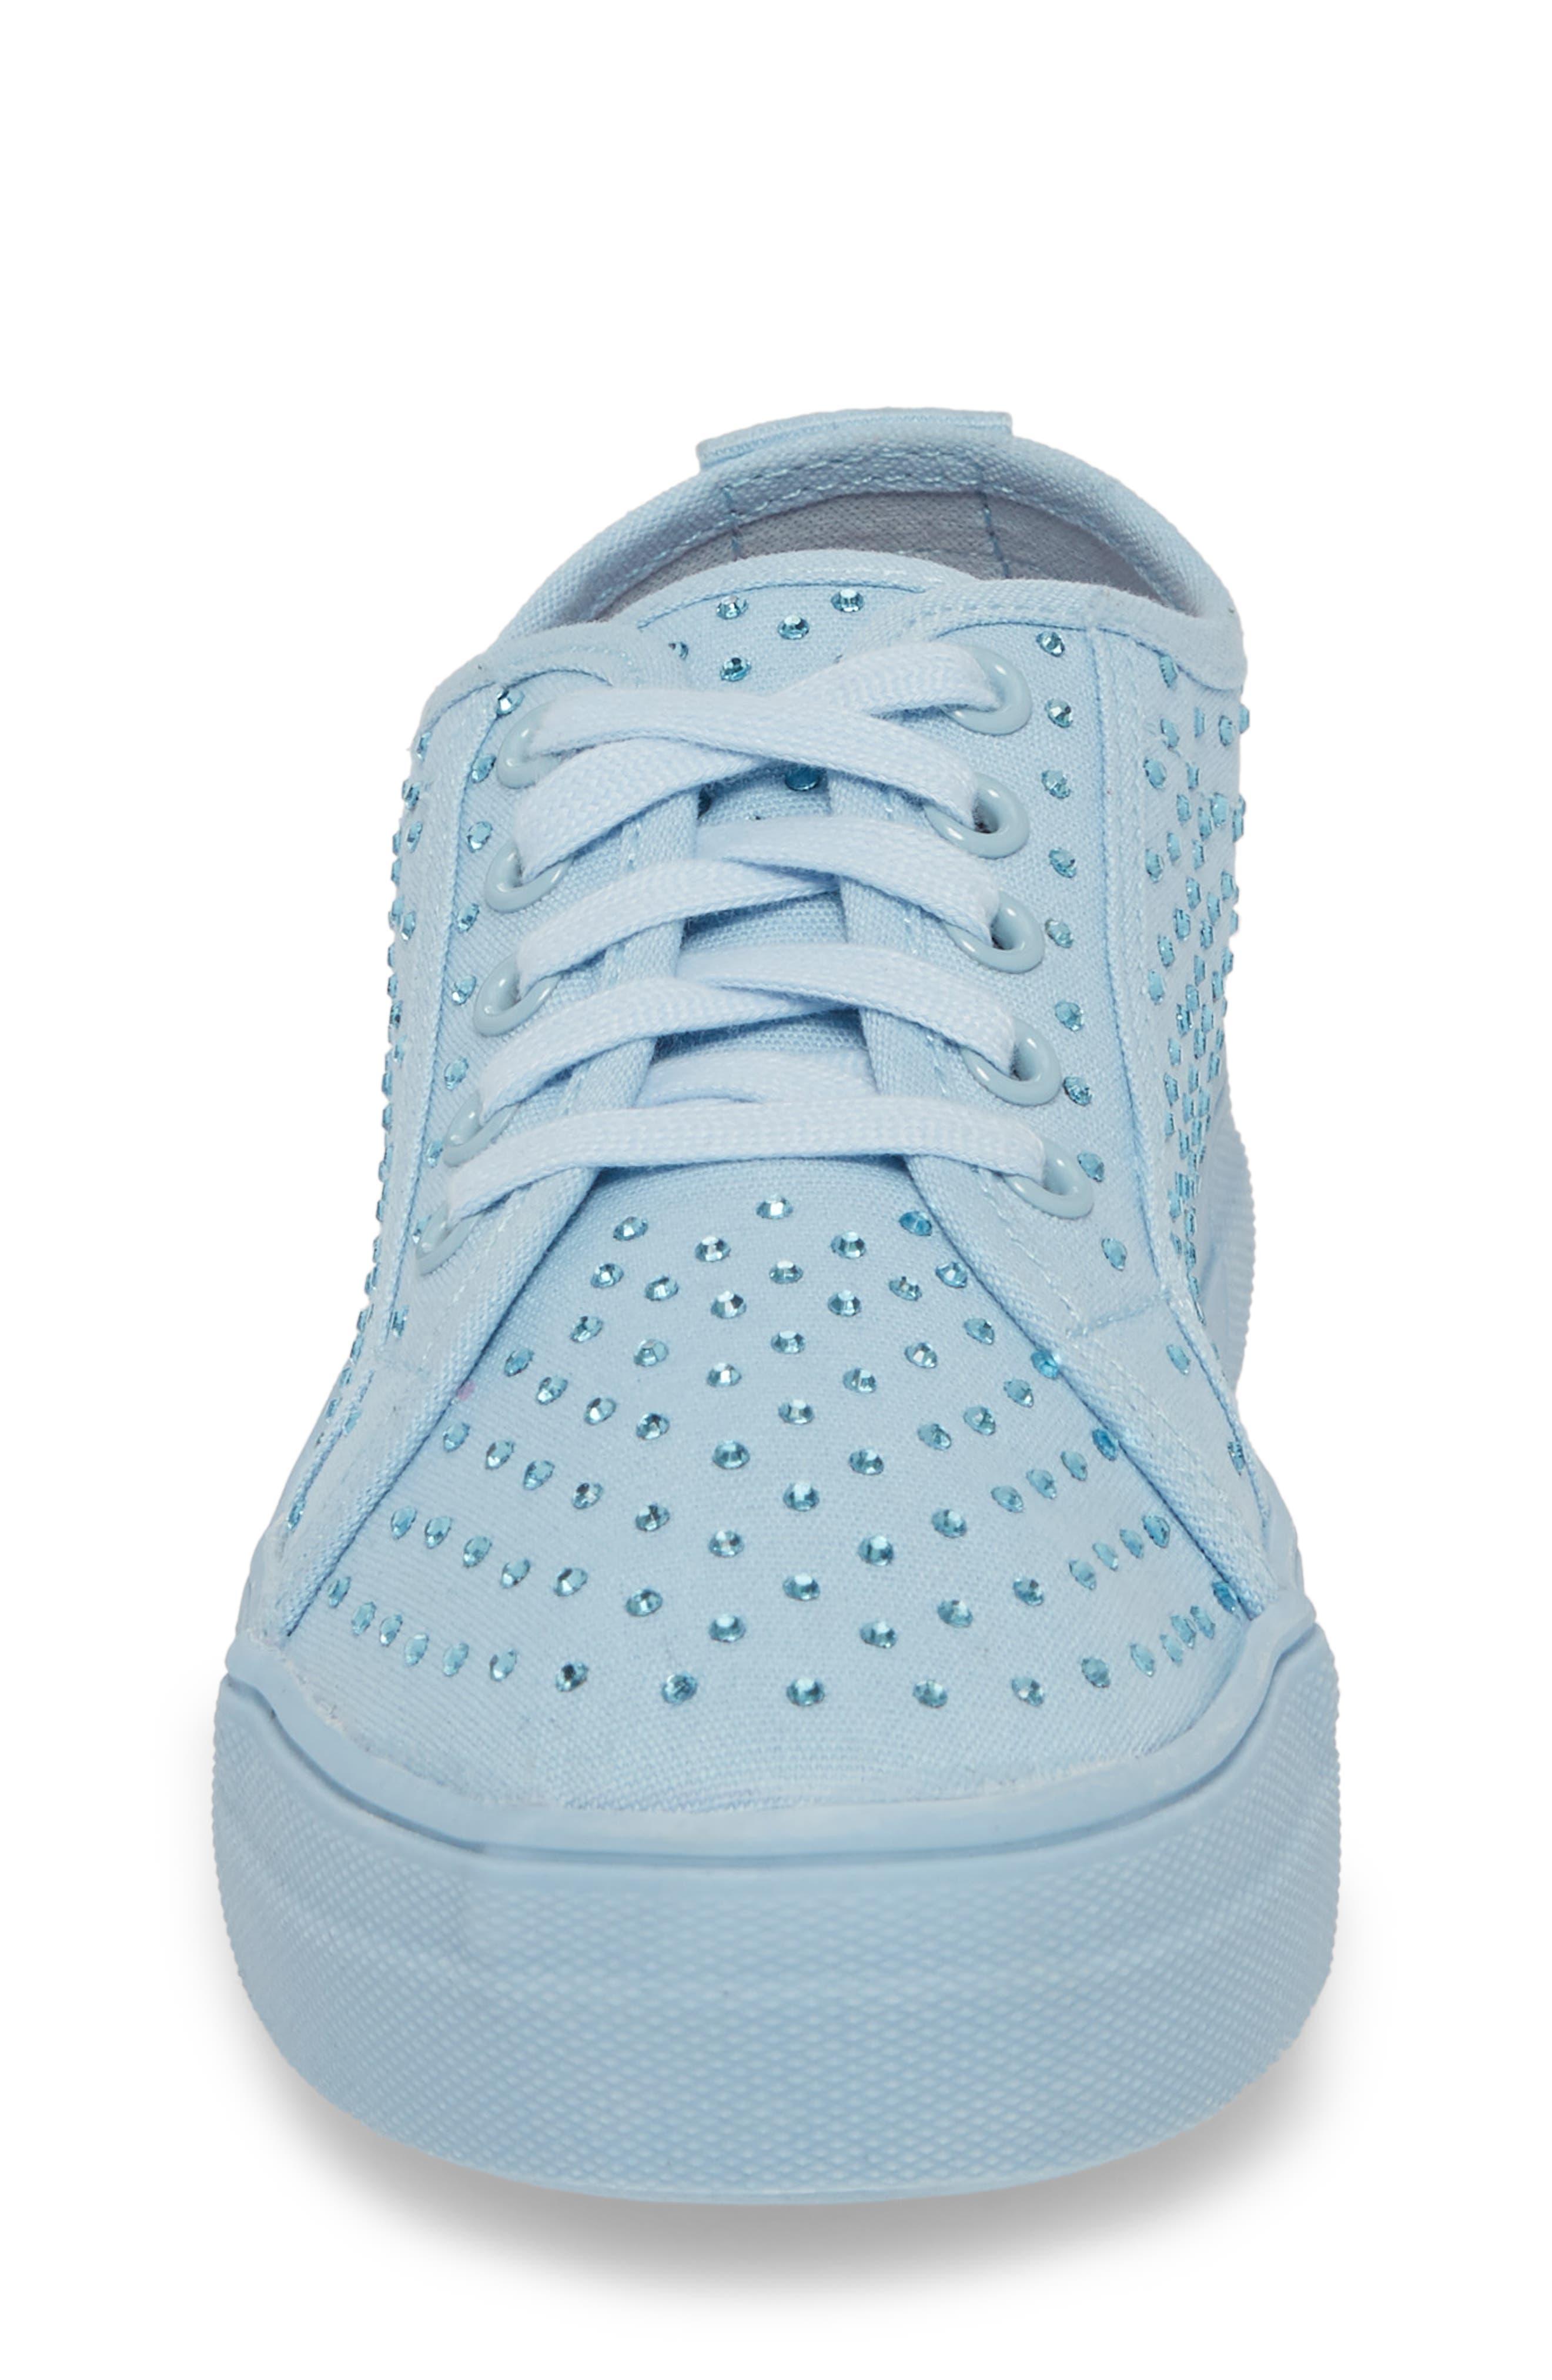 Jmono Sneaker,                             Alternate thumbnail 4, color,                             Blue